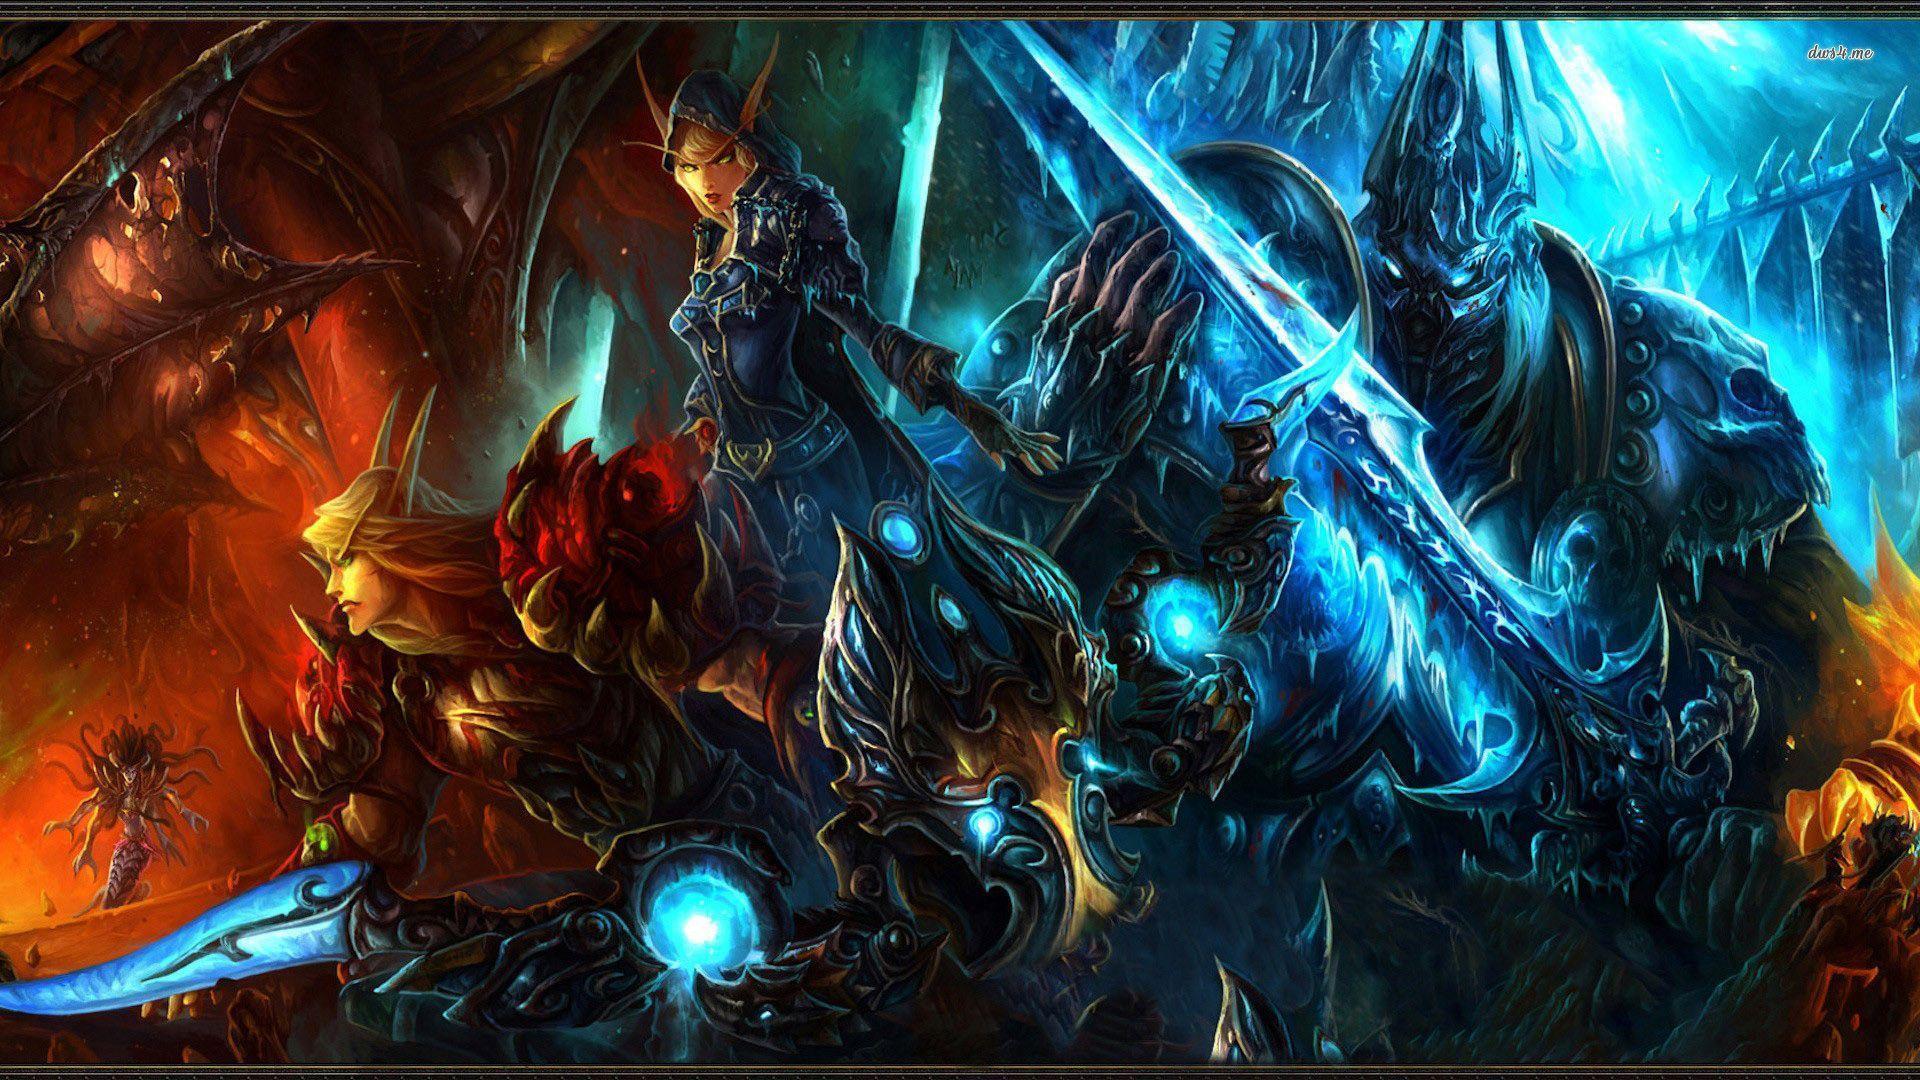 World of Warcraft wallpaper - Game wallpapers - #